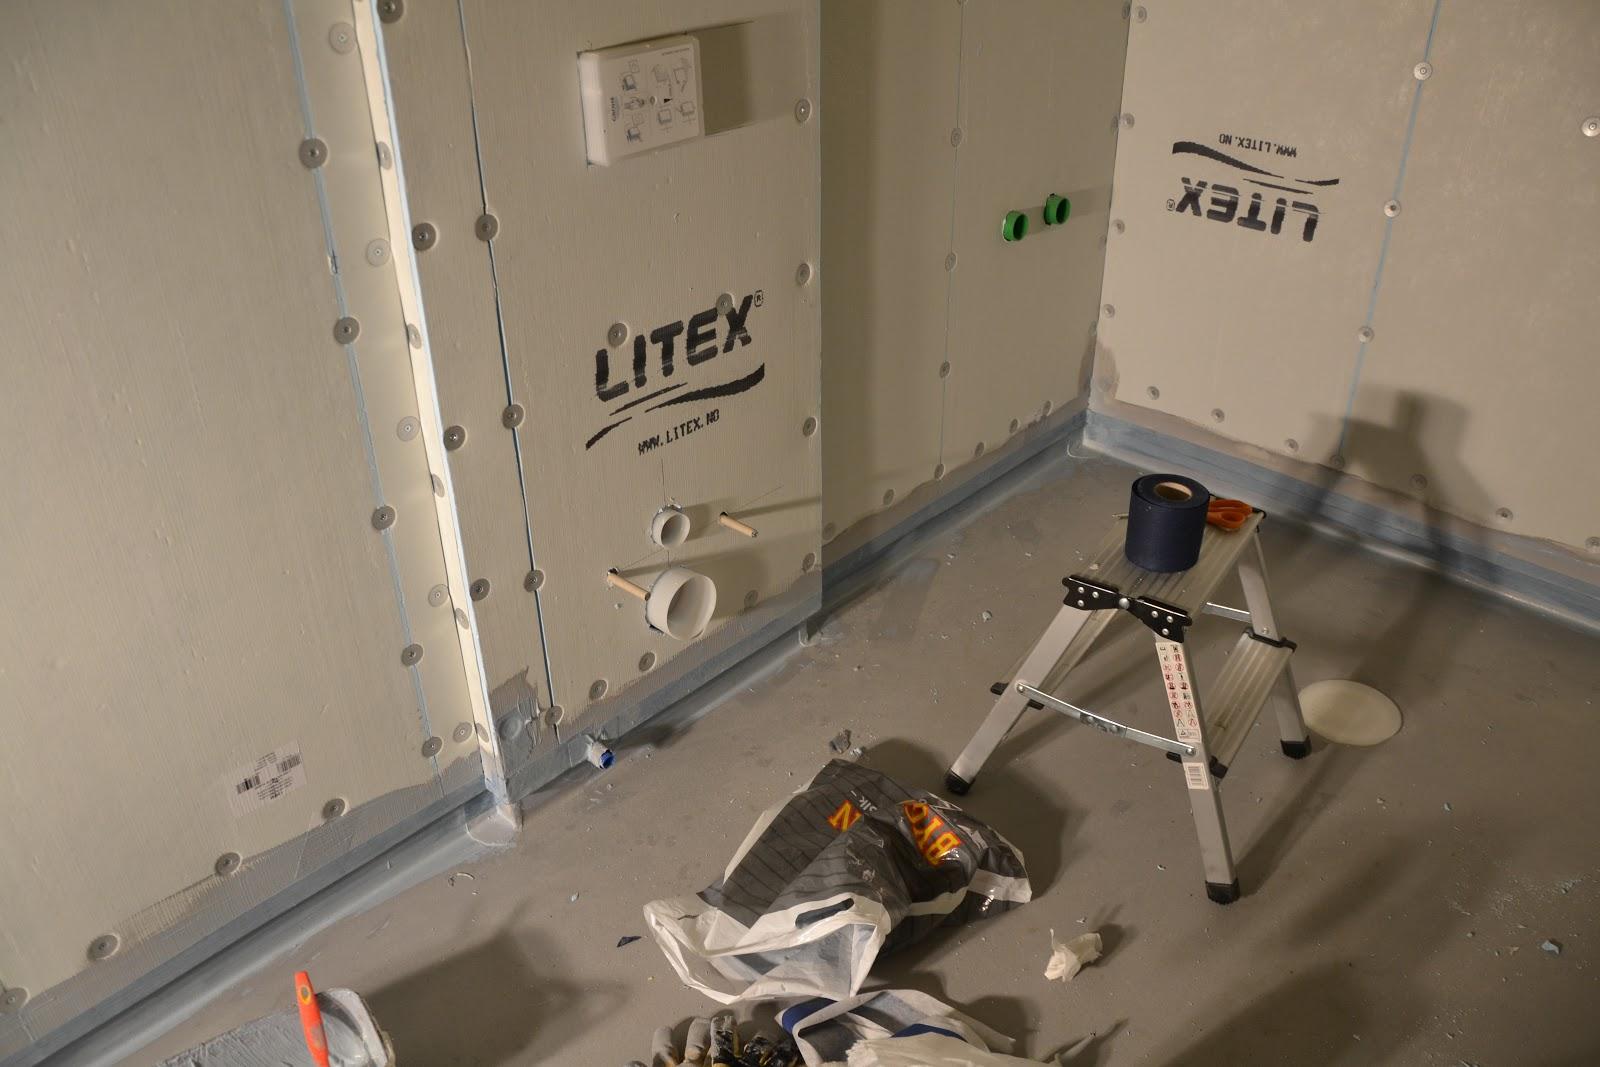 Litex baderomsplater